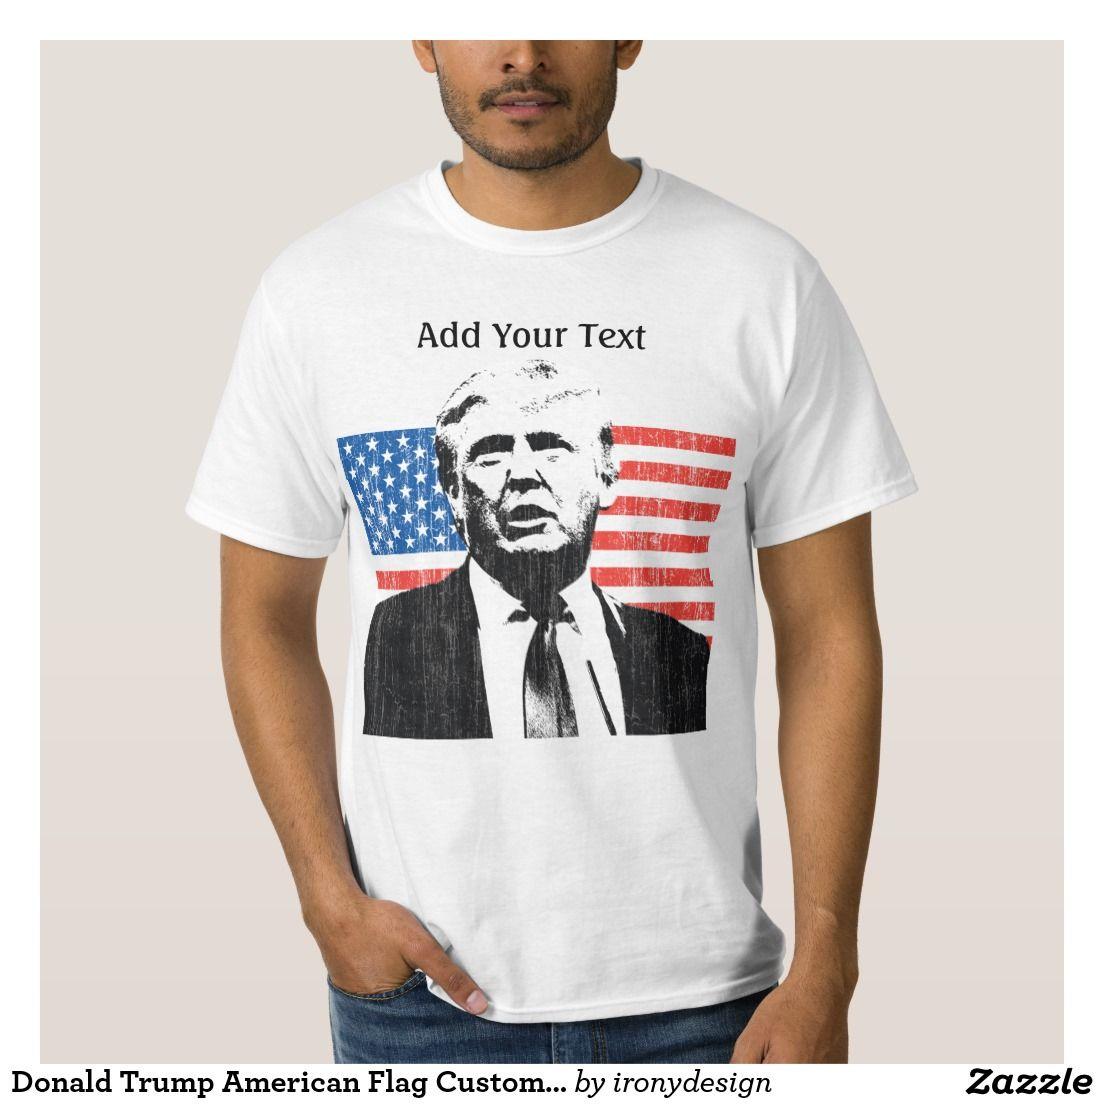 Design your own t shirt zazzle - Donald Trump American Flag Custom Text T Shirt